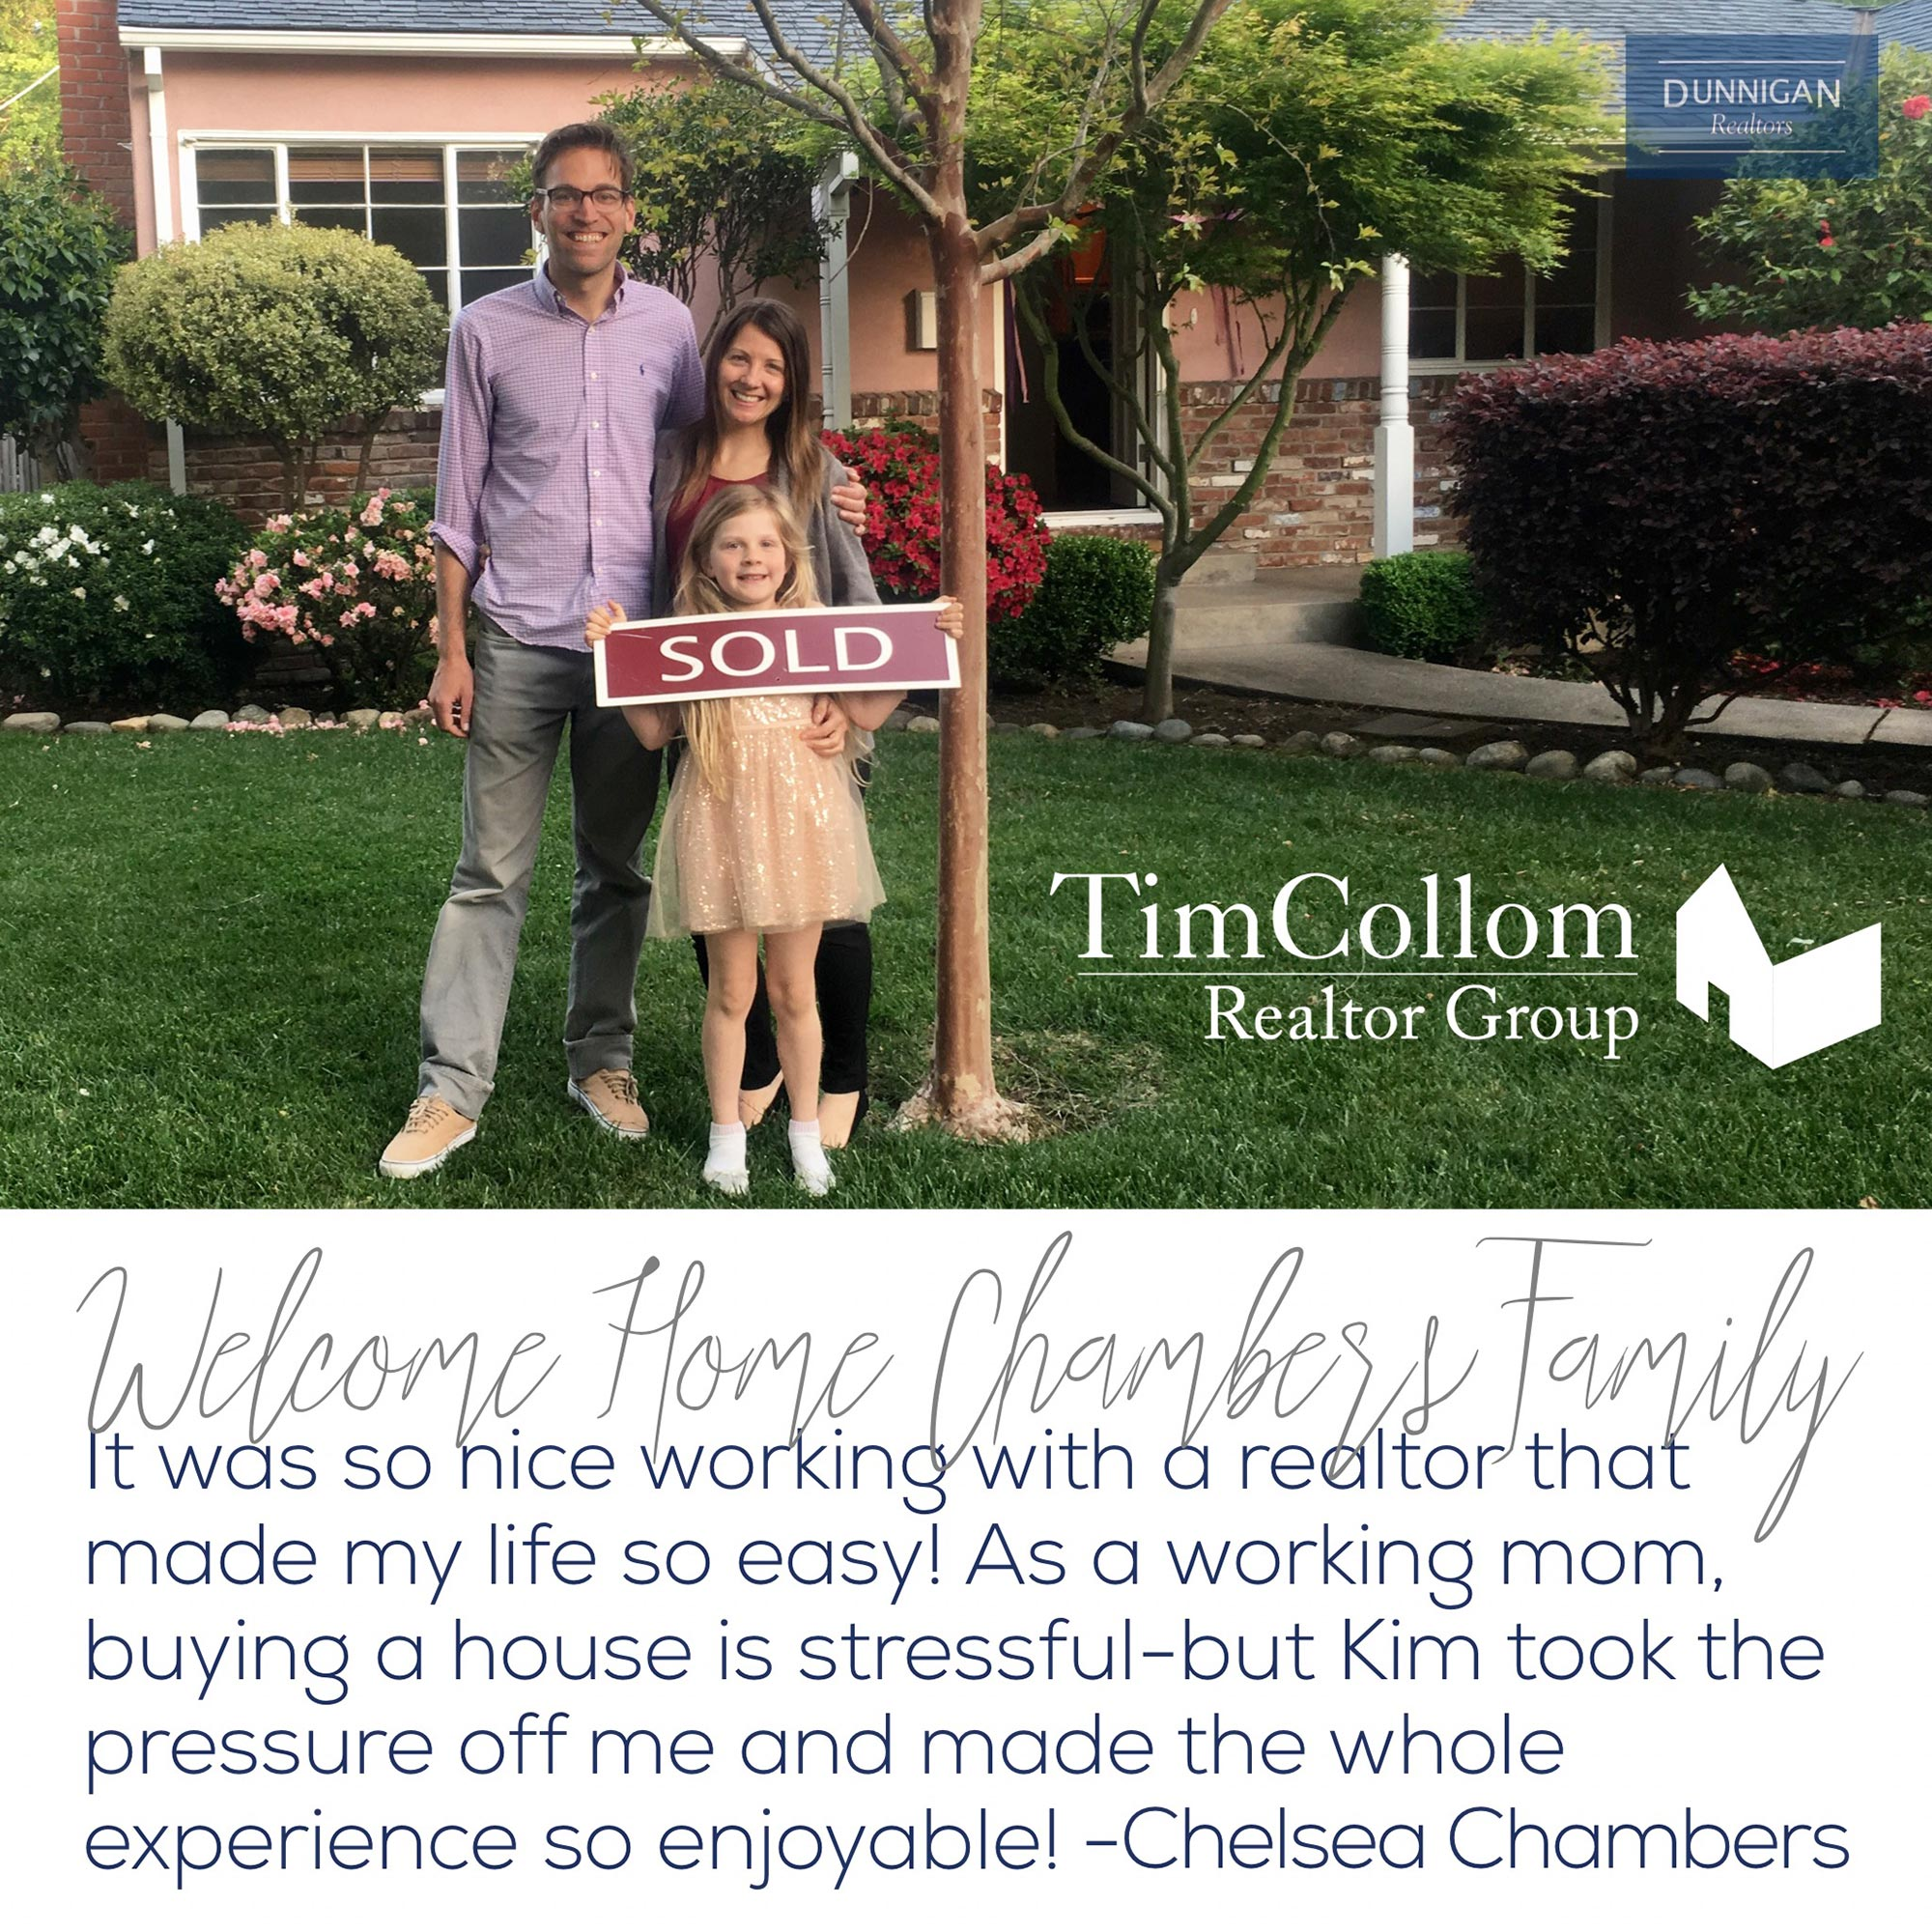 Tim Collom Realtor Group Testimonials